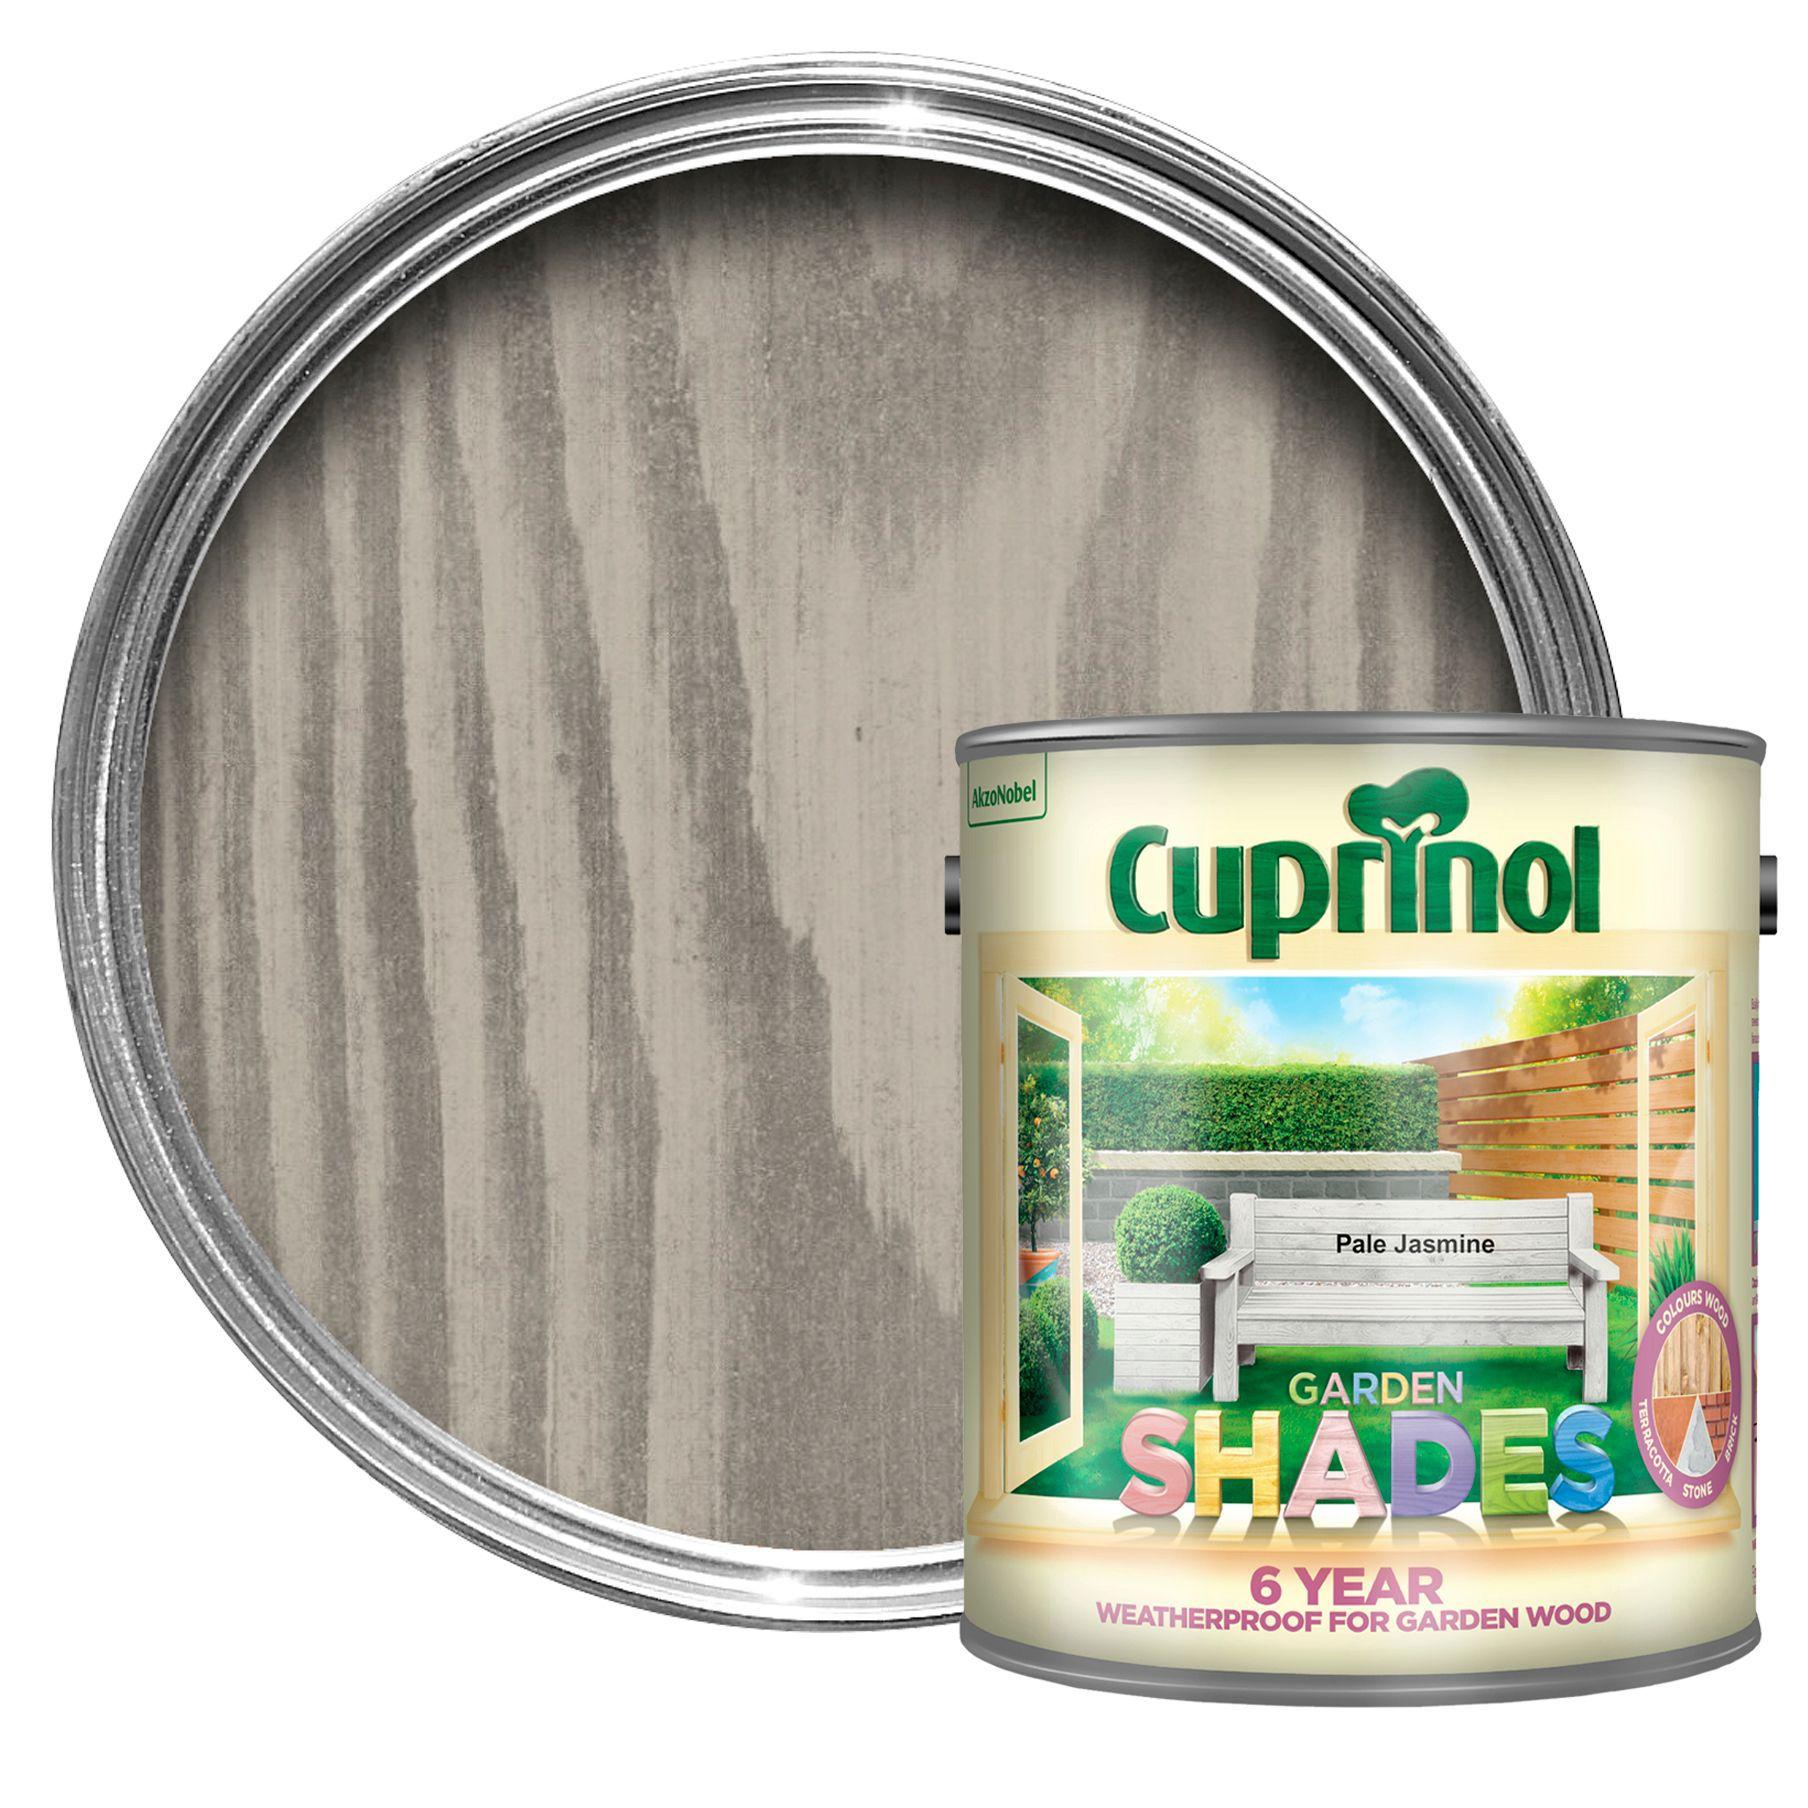 Cuprinol Garden Shades Pale Jasmine Matt Wood Paint 2.5l